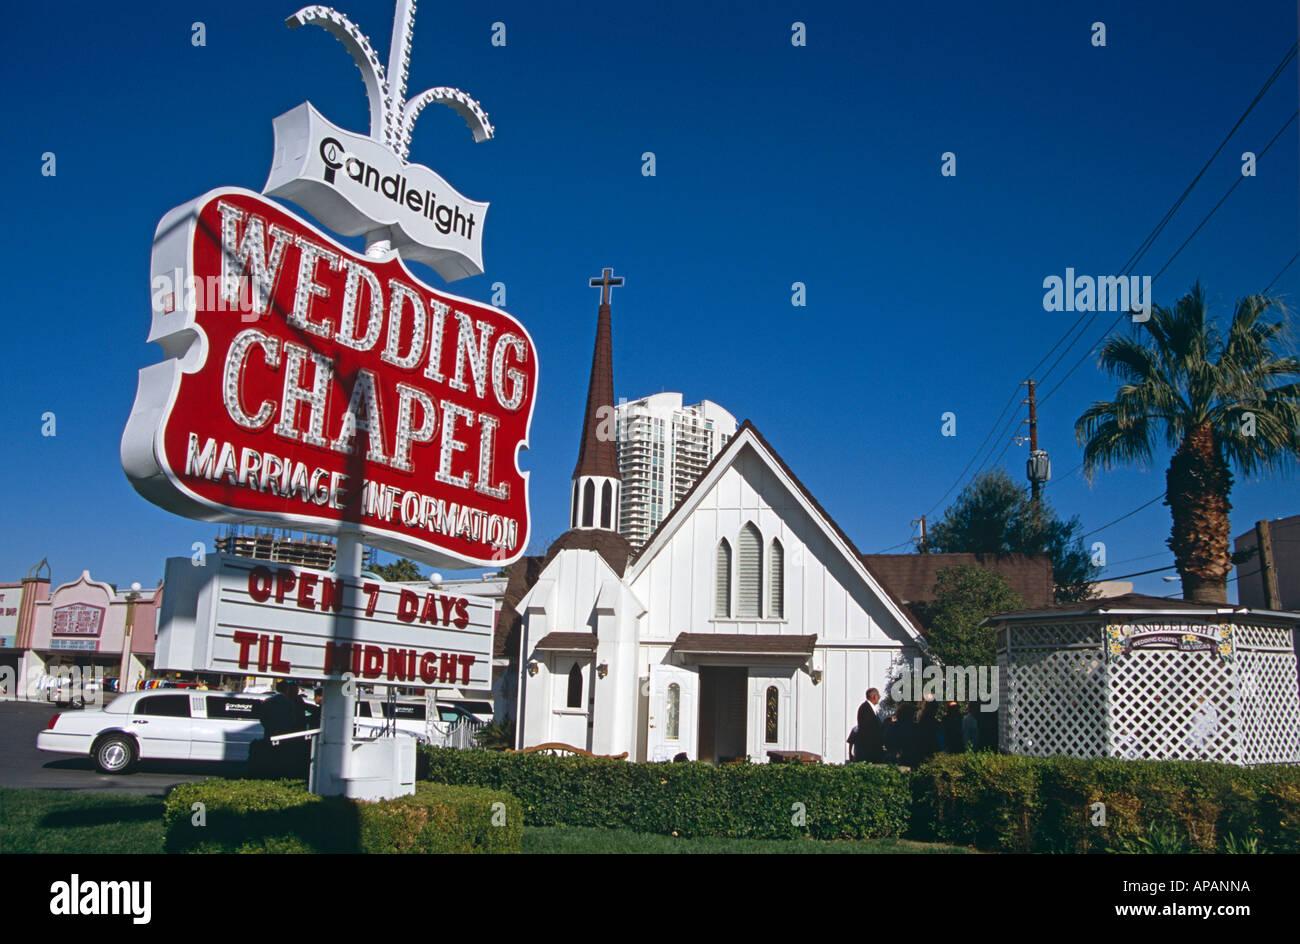 stock photo candlelight wedding chapel las vegas nevada usa vegas wedding chapels Candlelight Wedding Chapel Las Vegas Nevada USA